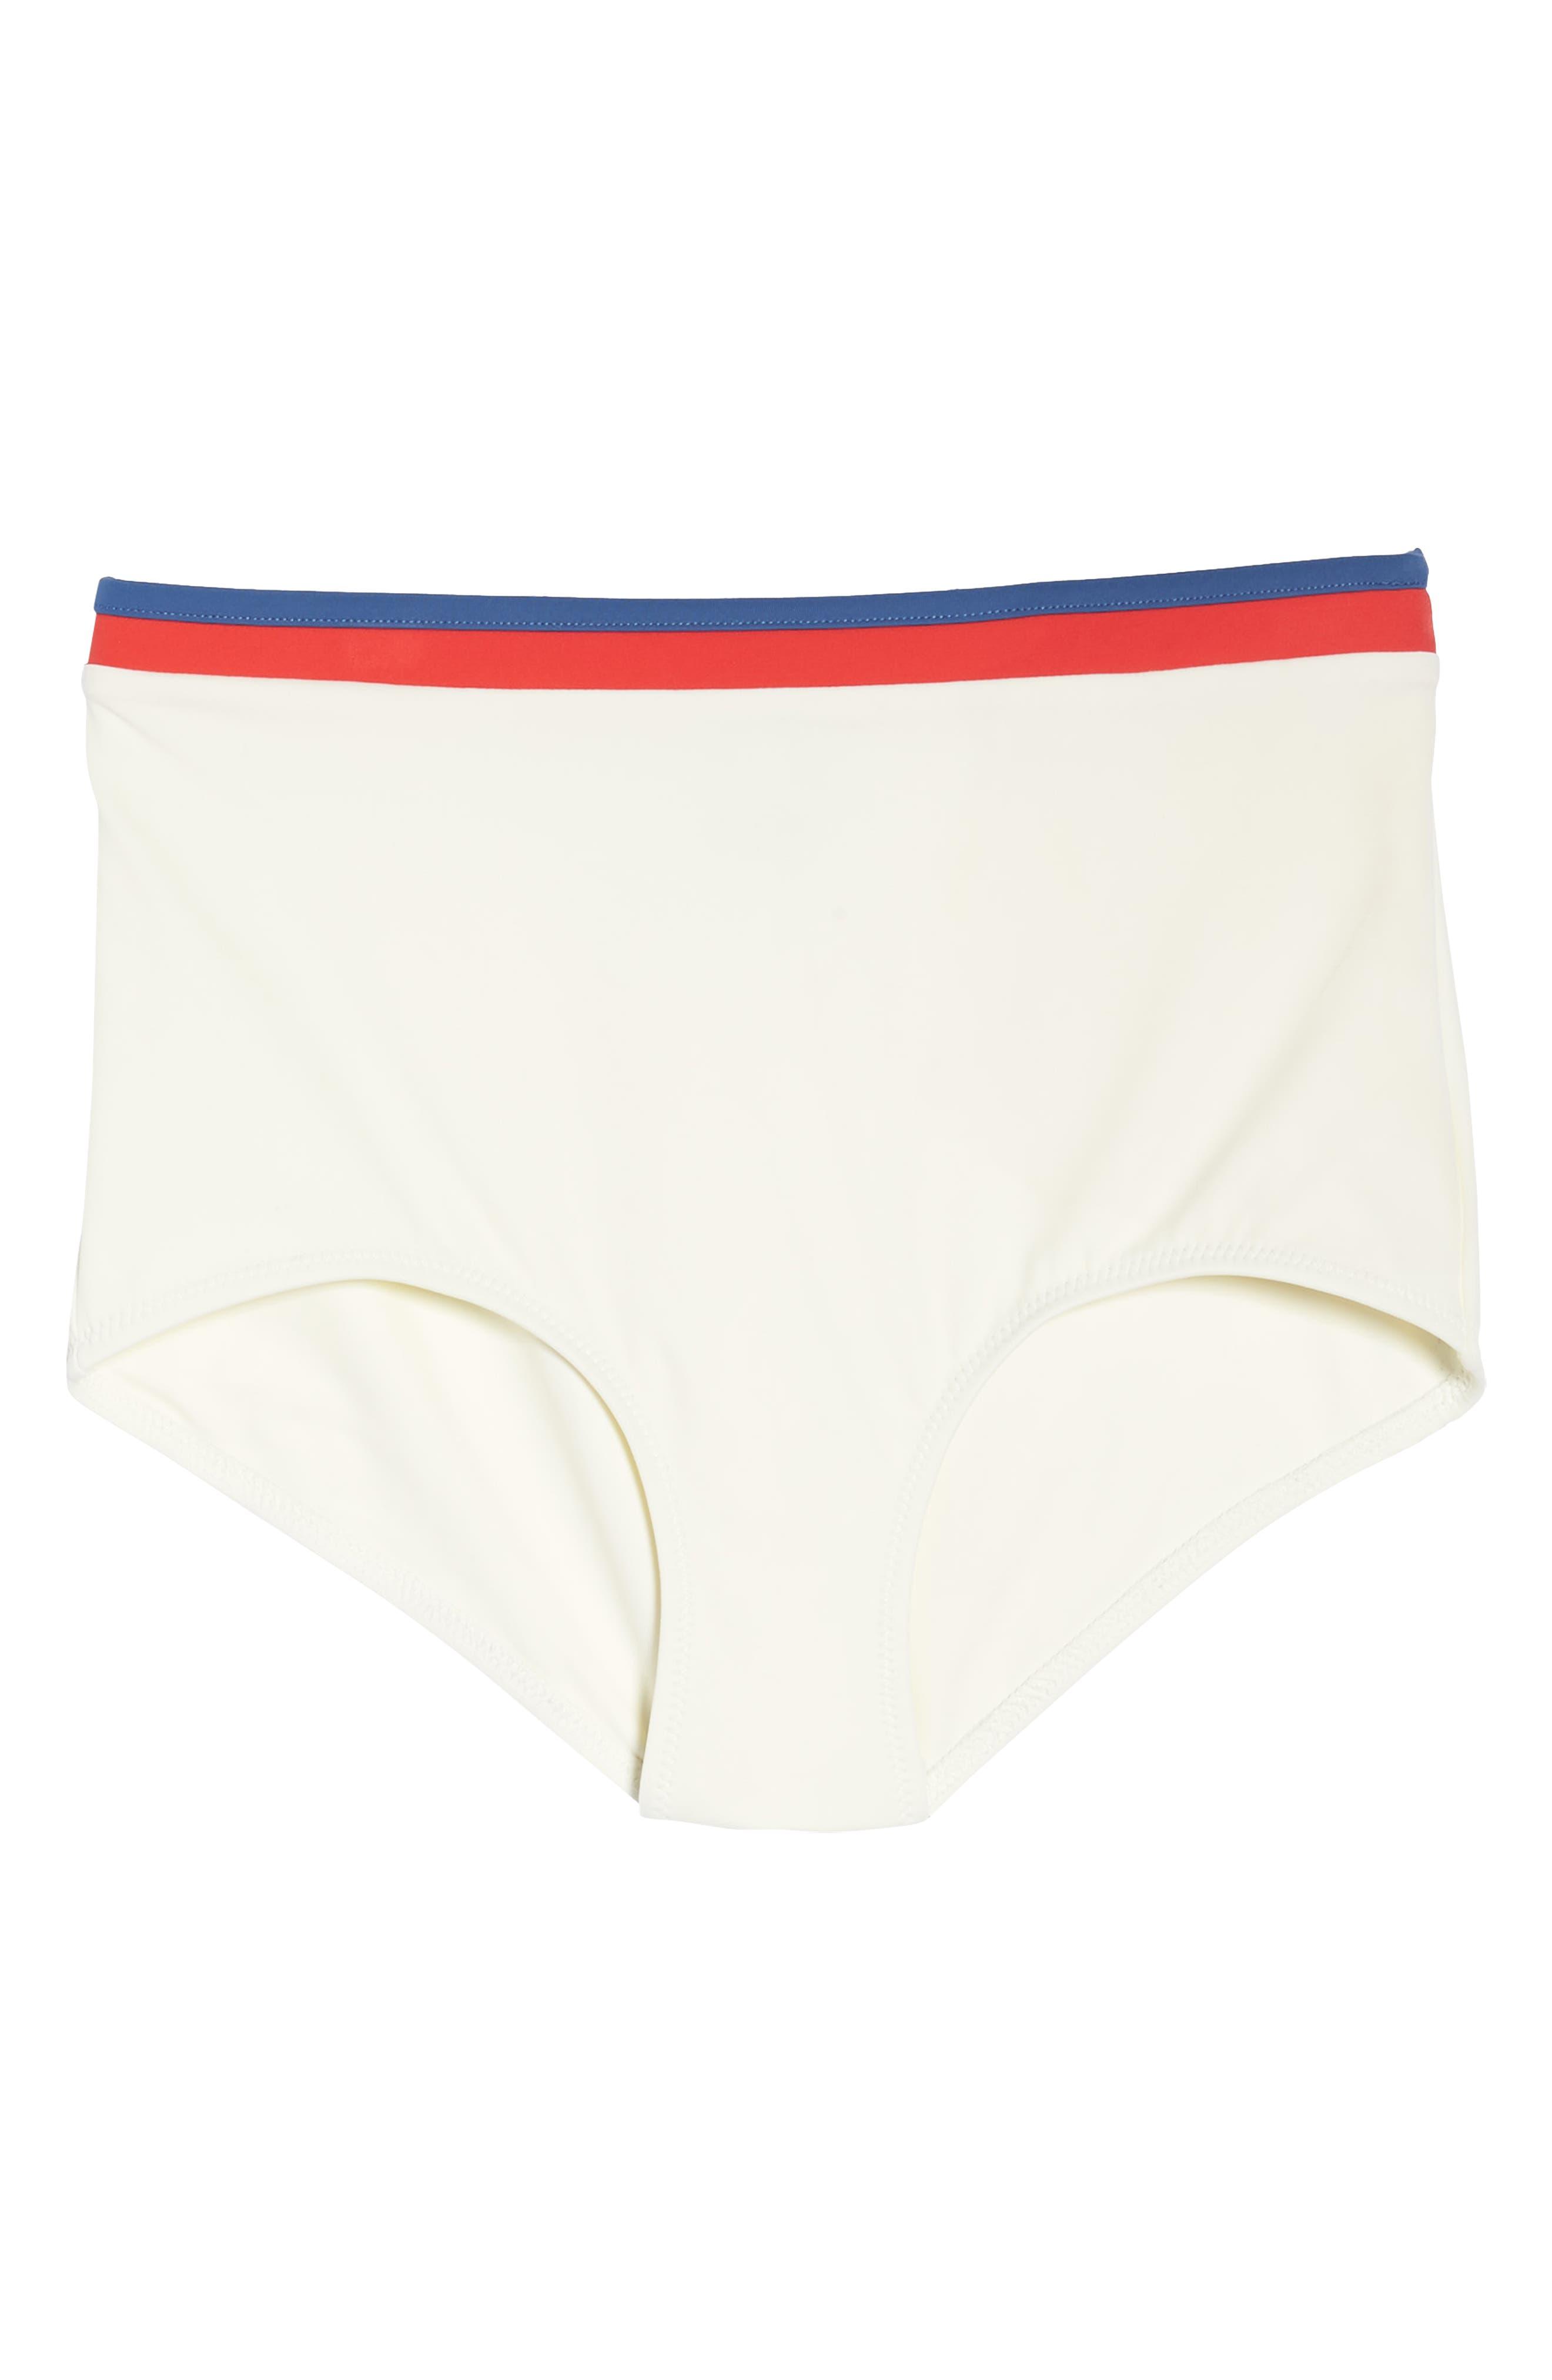 Solid & Stripe Katie High Waist Bikini Bottoms,                             Alternate thumbnail 6, color,                             900